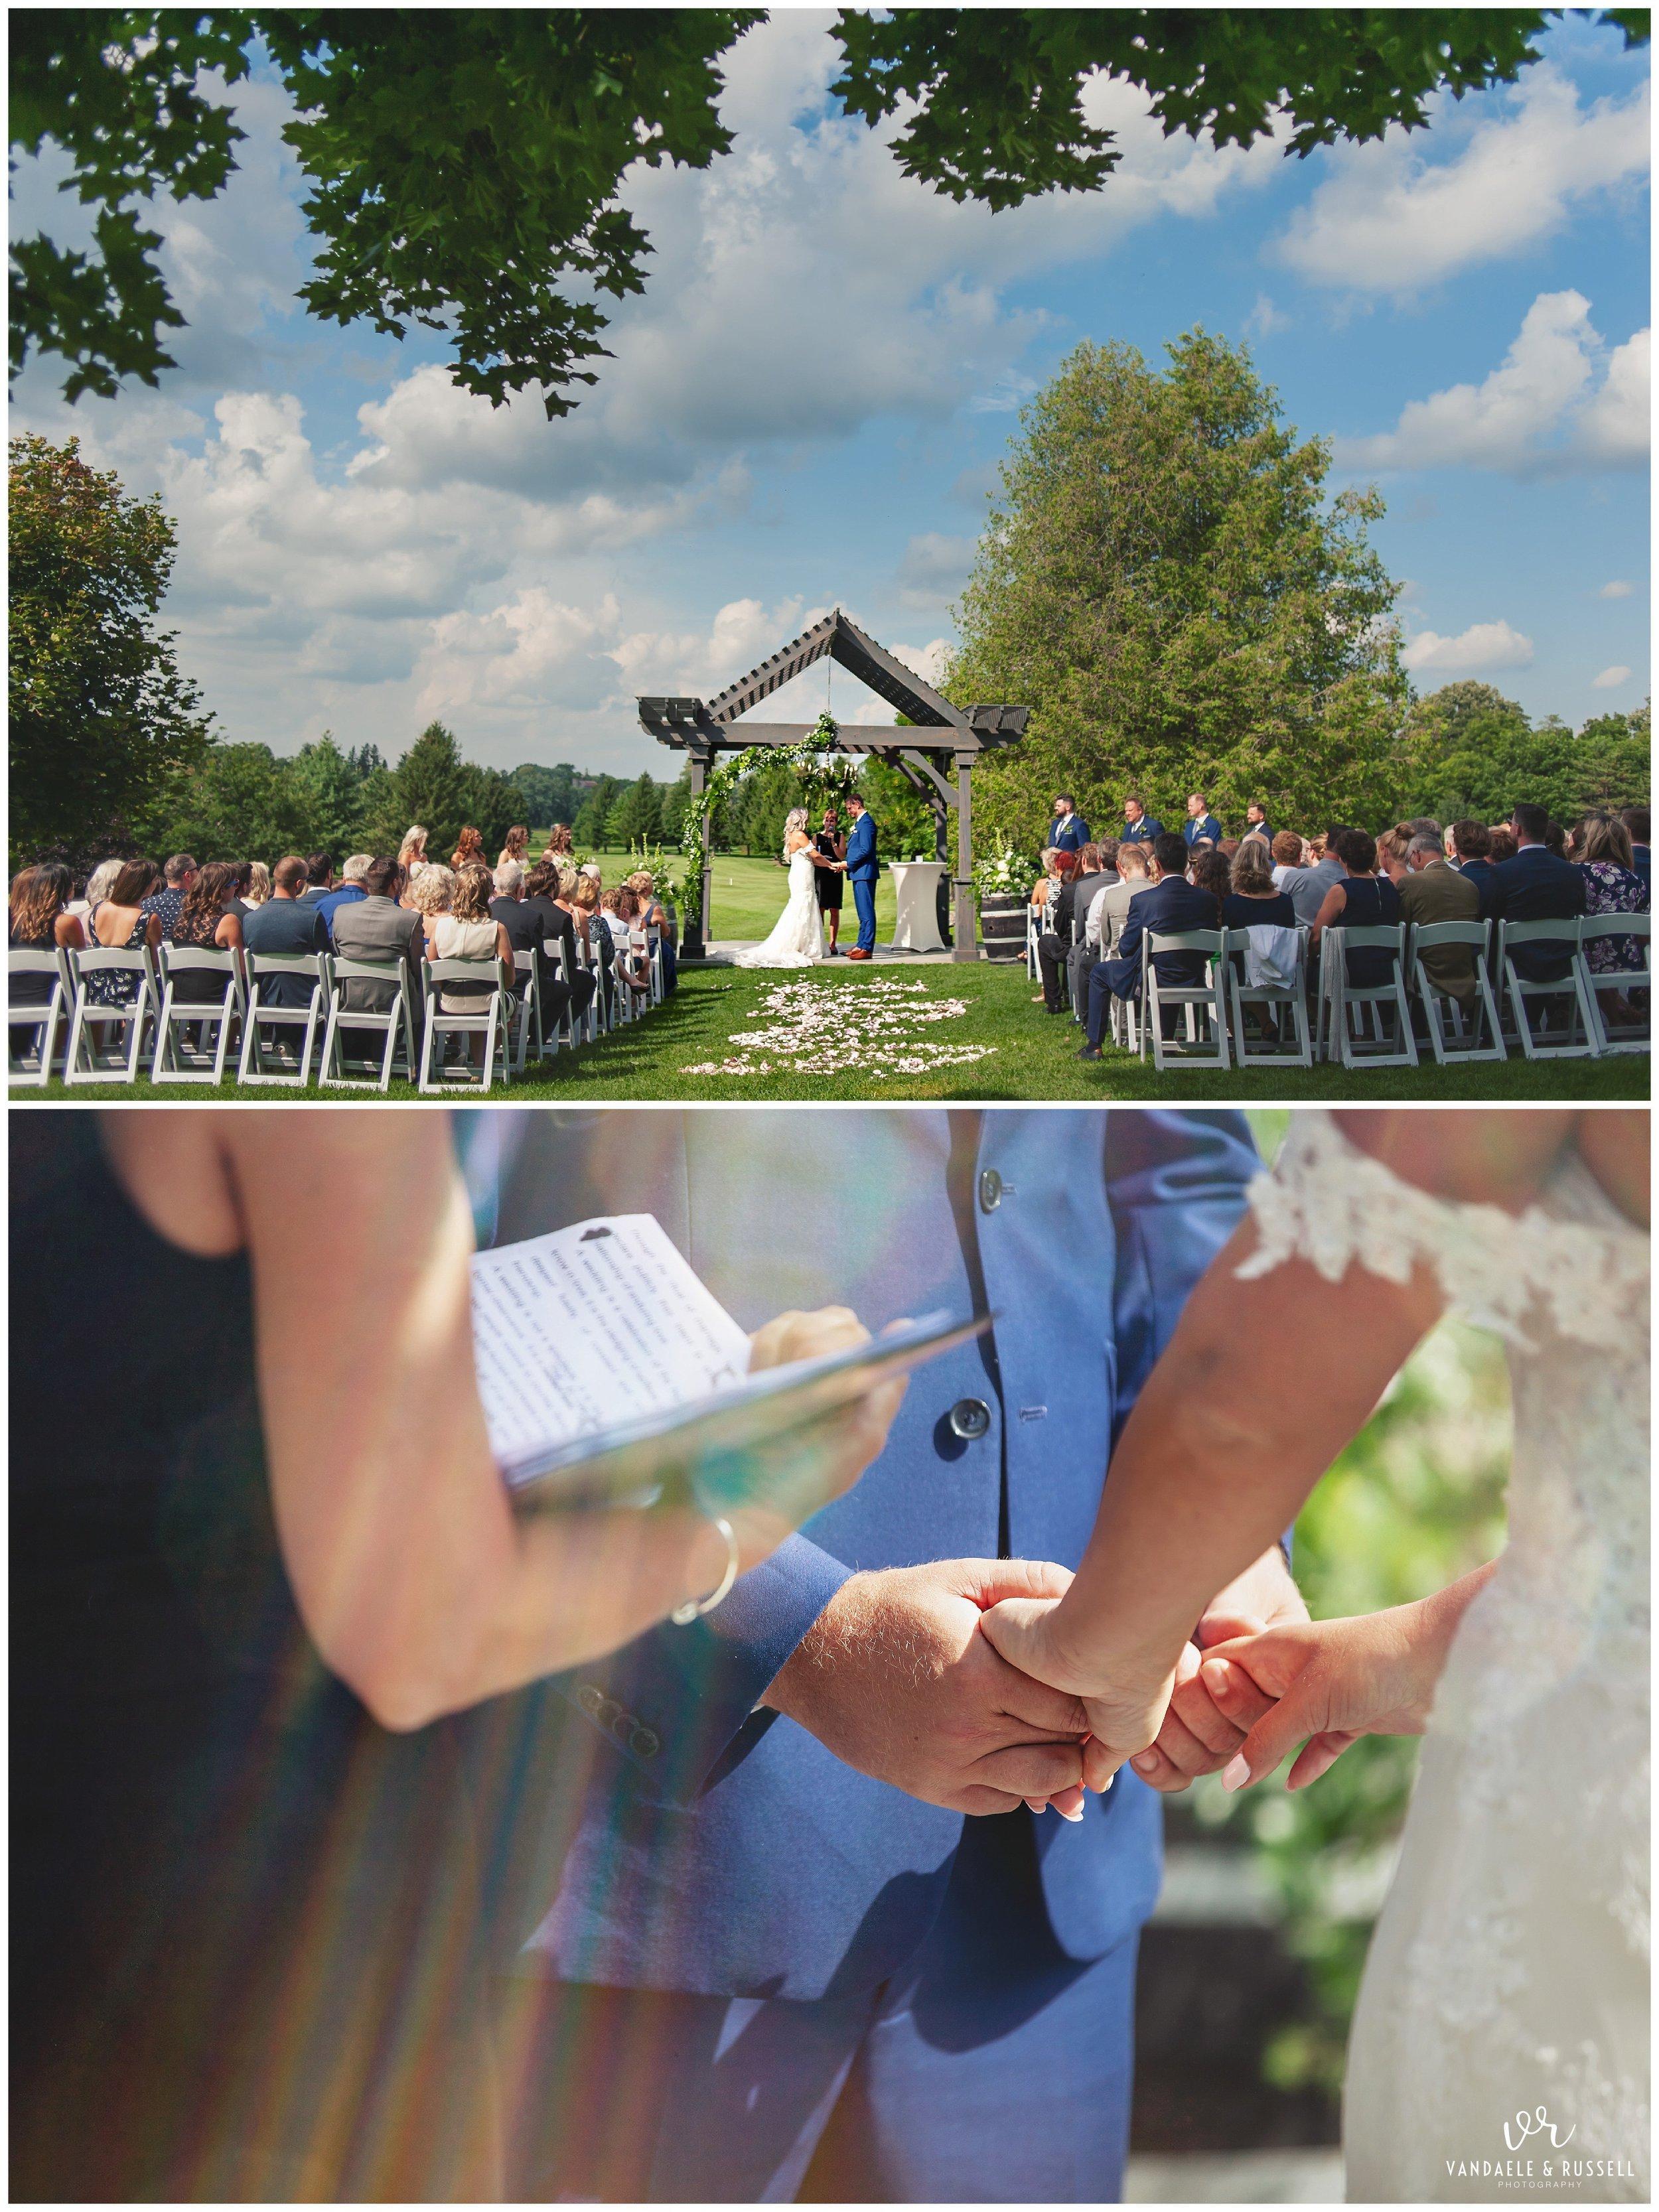 VanDaele-Russell-Wedding-Photography-London-Toronto-Ontario_0165.jpg